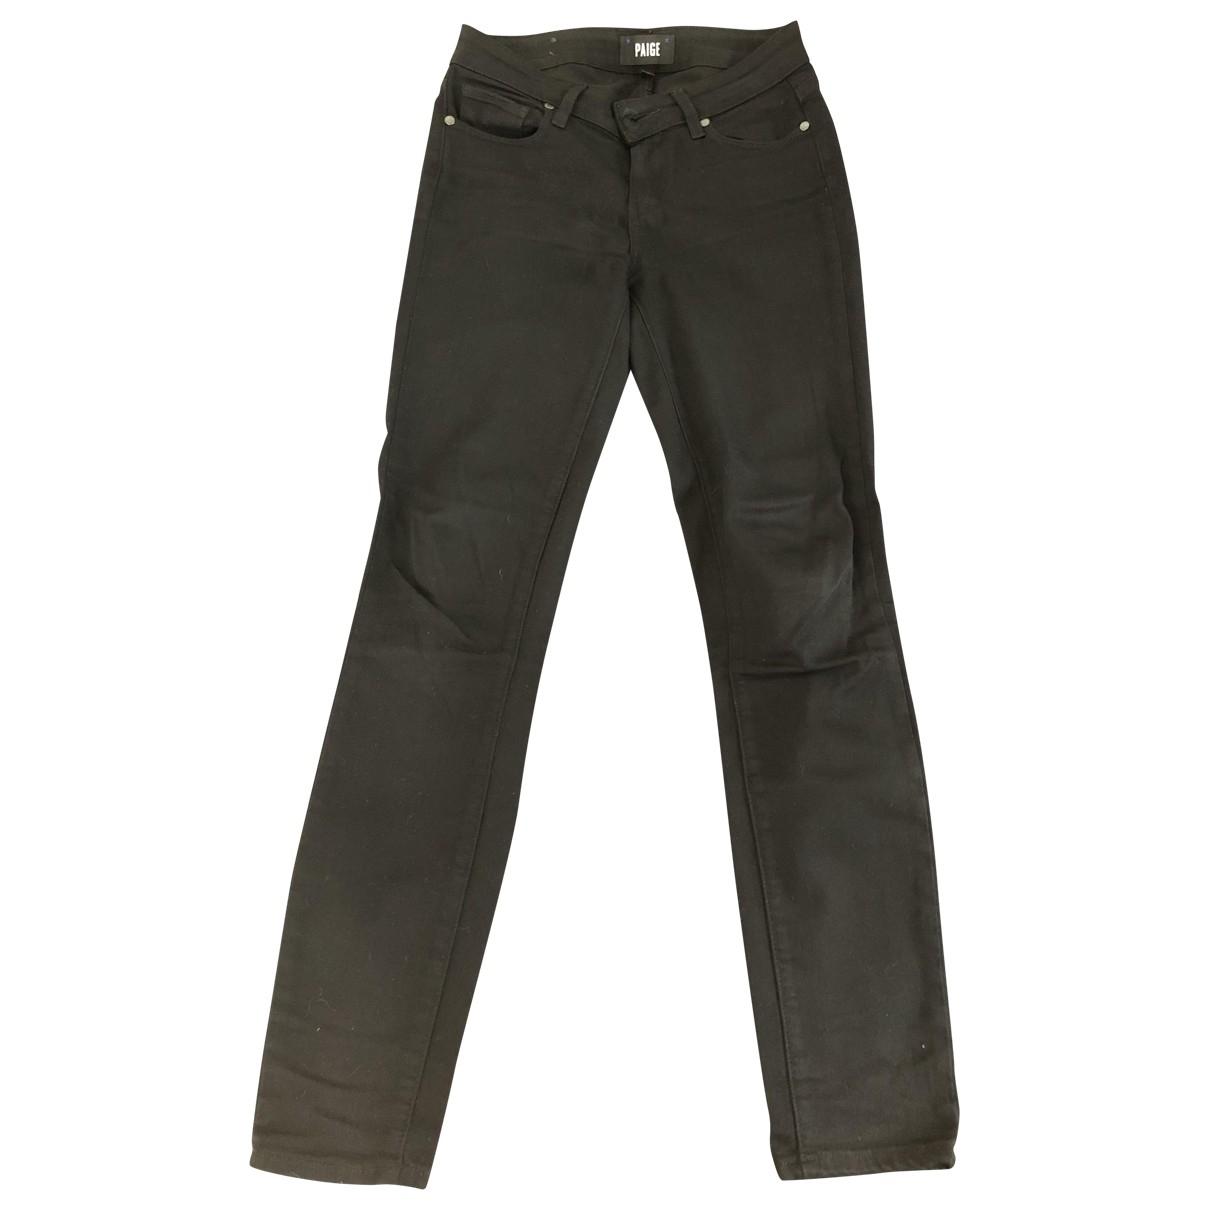 Paige Jeans \N Black Cotton - elasthane Jeans for Women 25 US